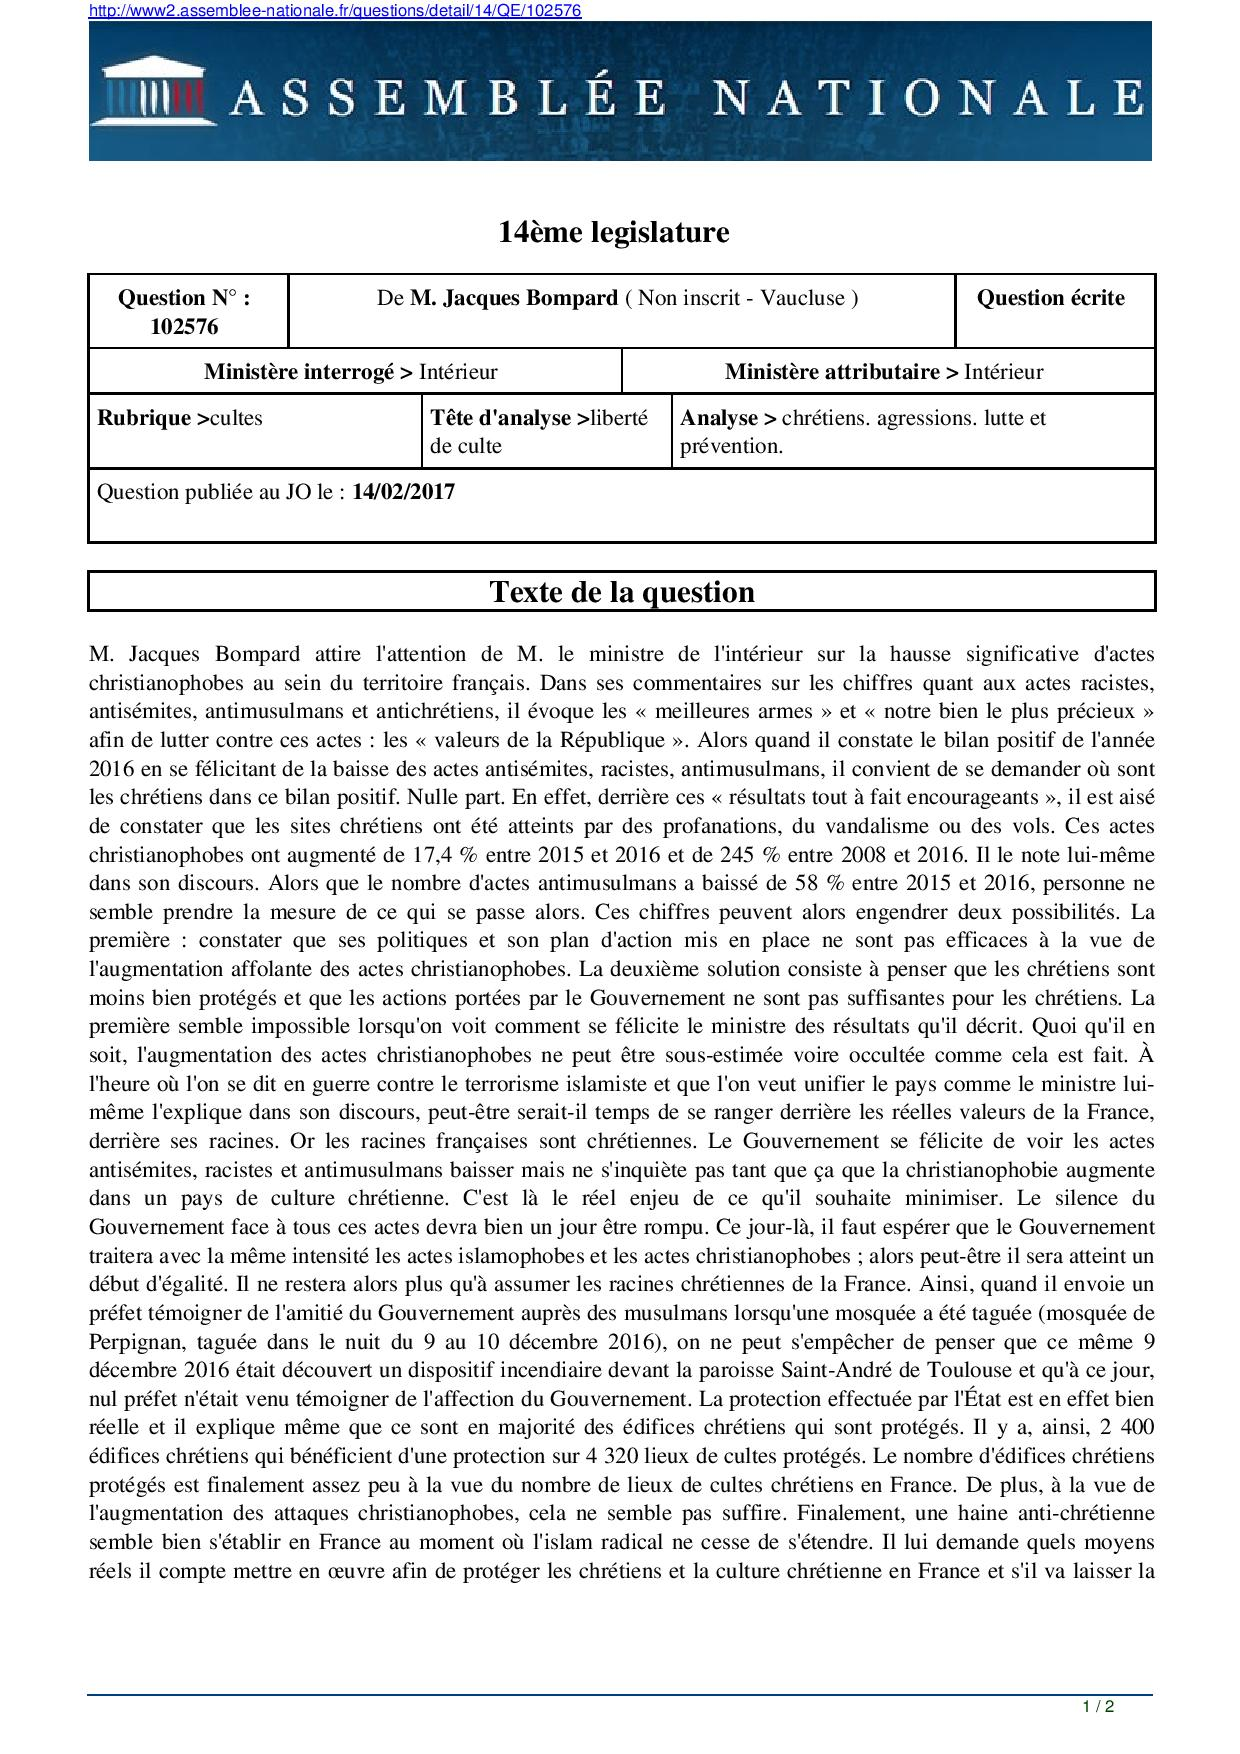 QST-AN-14-102576QE-page-001